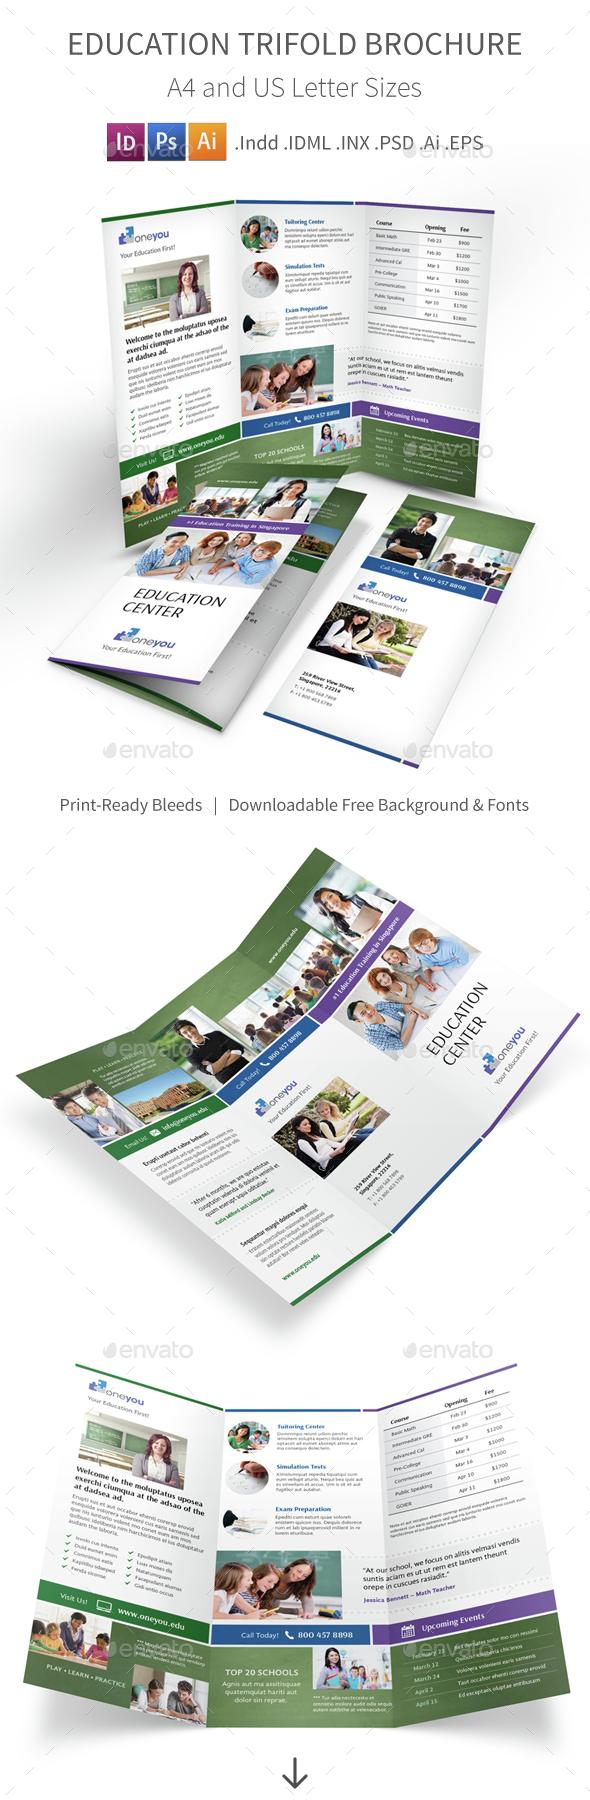 Education Trifold Brochure 4 - Informational Brochures